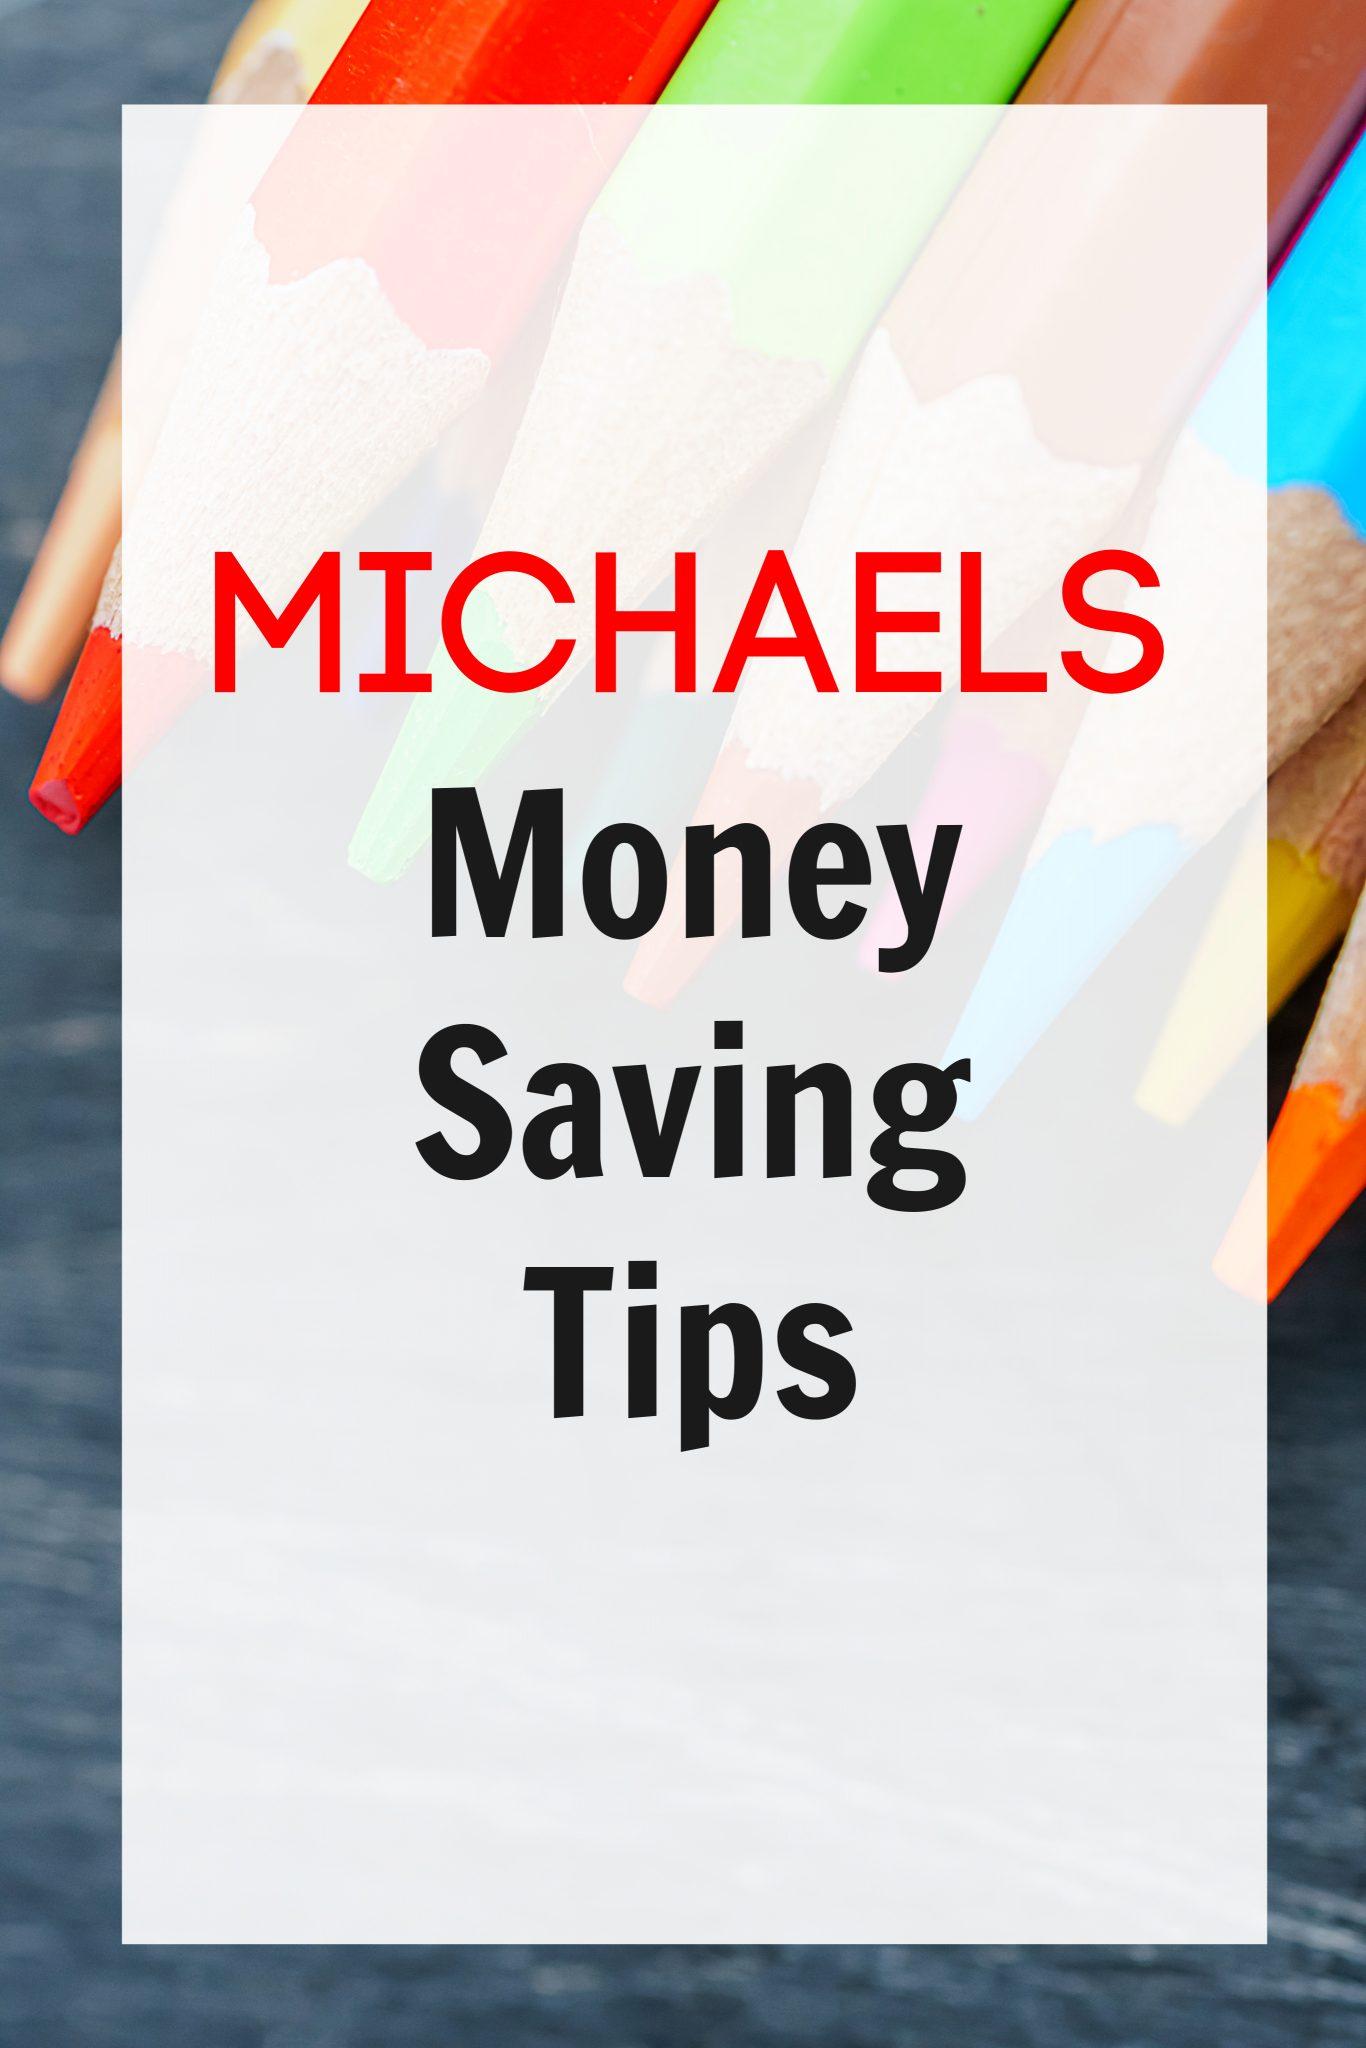 Michaels Money Saving Tips FrugallyFantastic.com